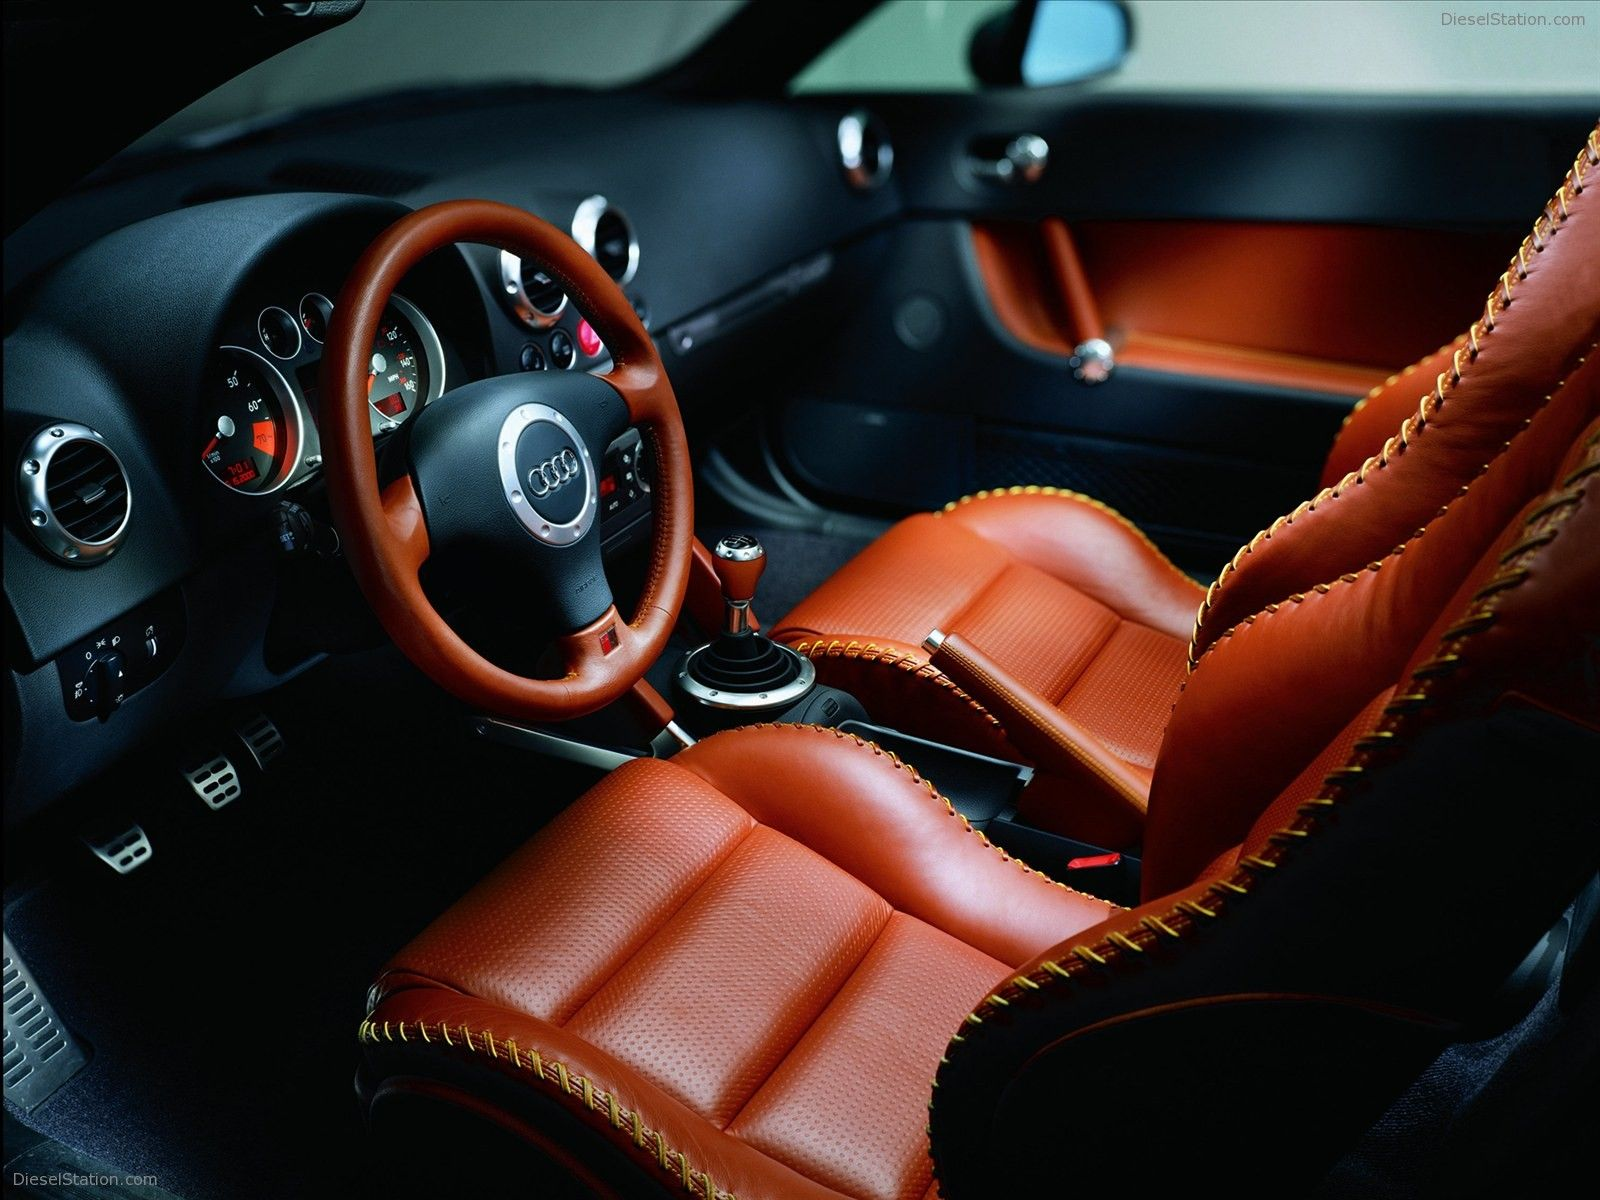 Audi TT 2002 Exotic Car Pictures #06 of 14 : DieselStation ...